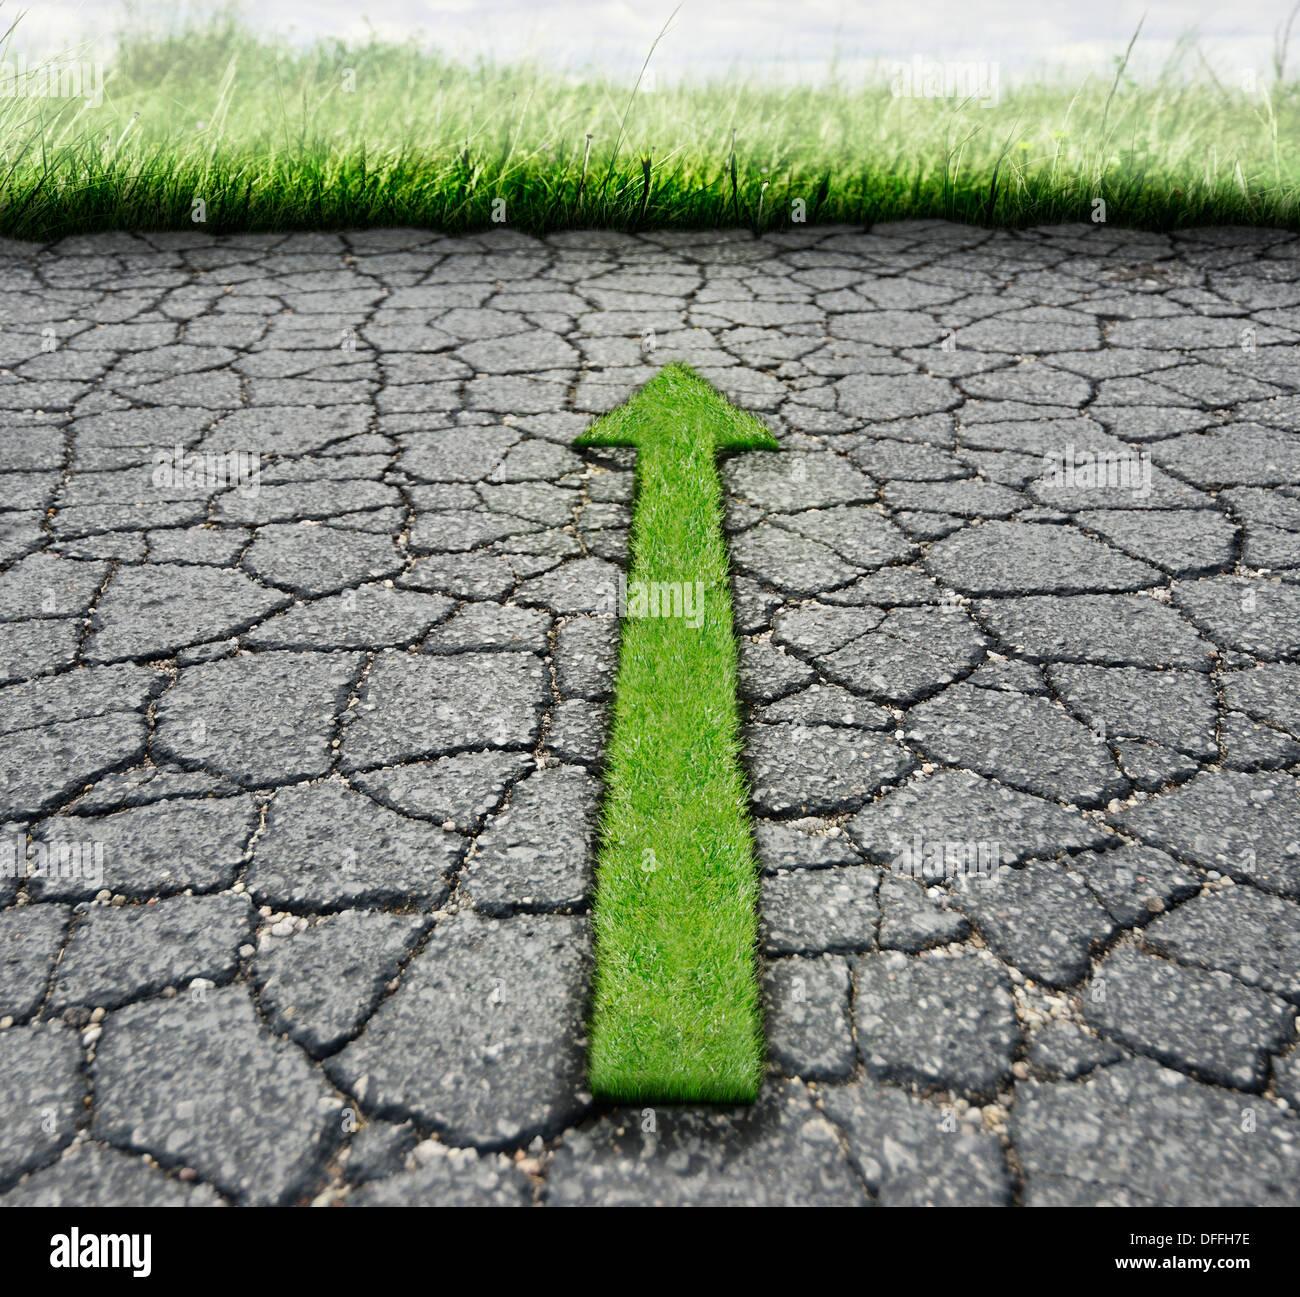 Broken Asphalt And Green Grass.Nature Concept - Stock Image